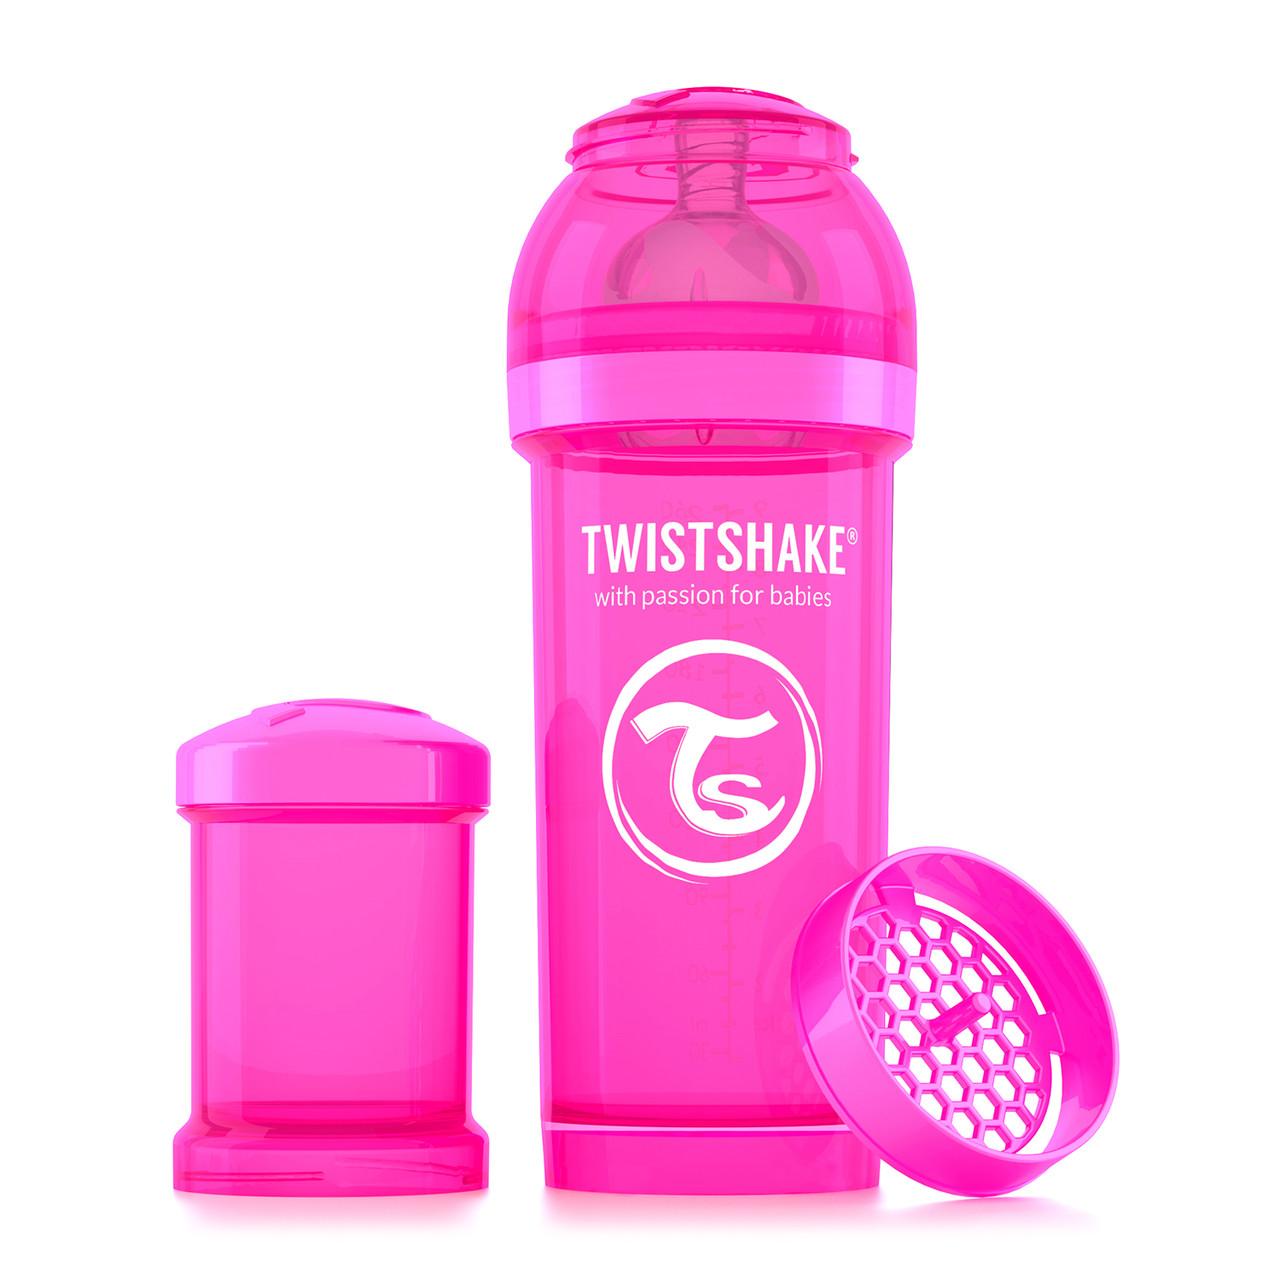 Антиколиковая бутылочка Twistshake для кормления 260 мл. Розовая (Crazymonkey)